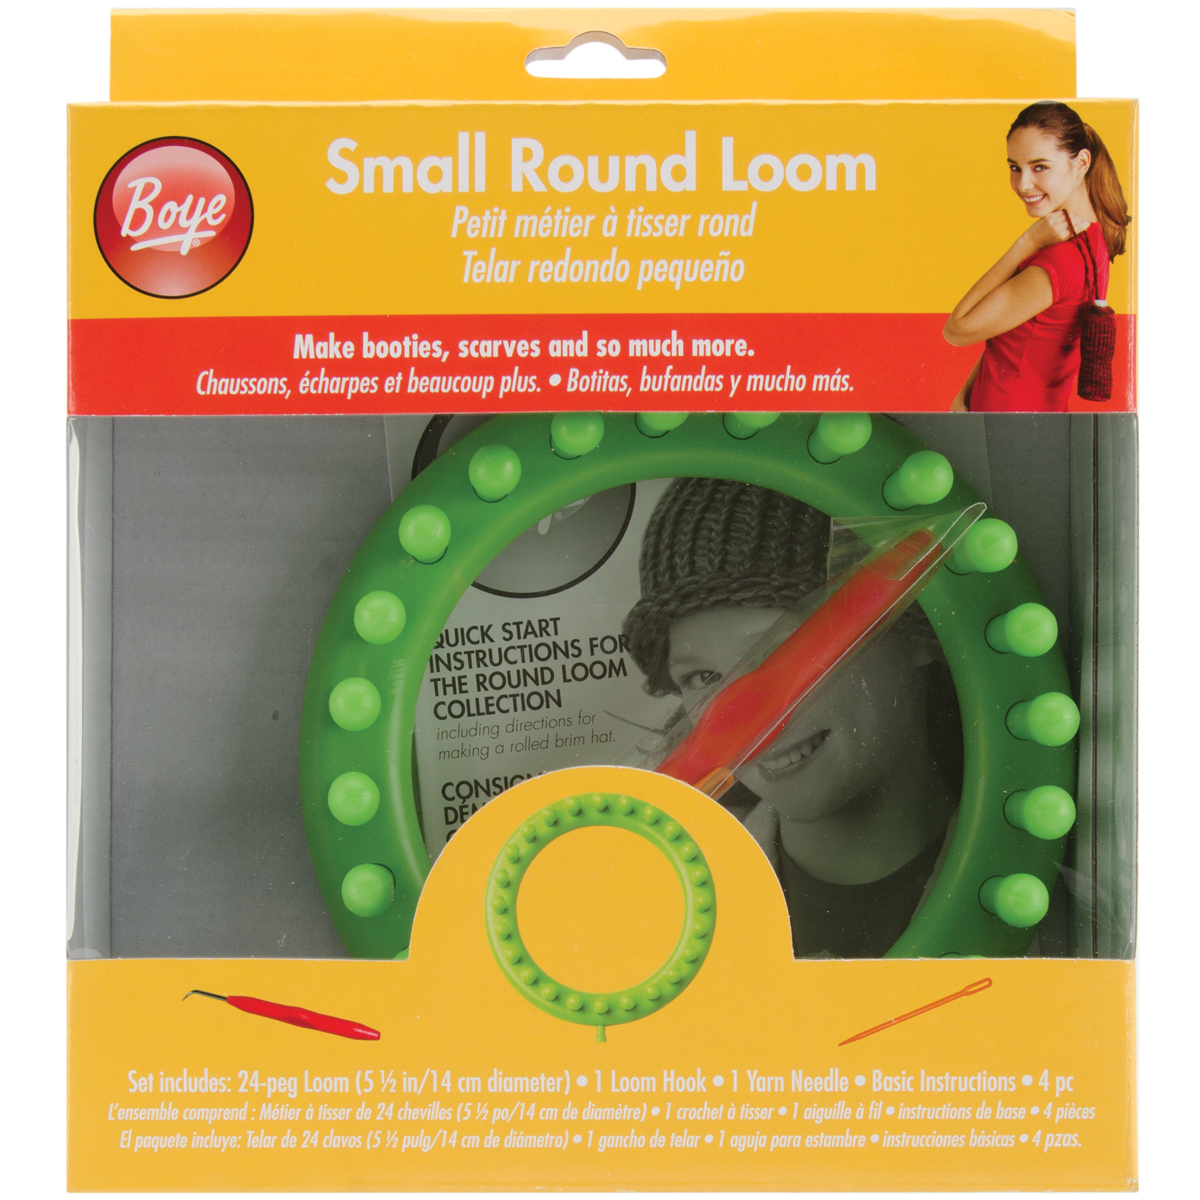 Boye Small Round Loom Joann